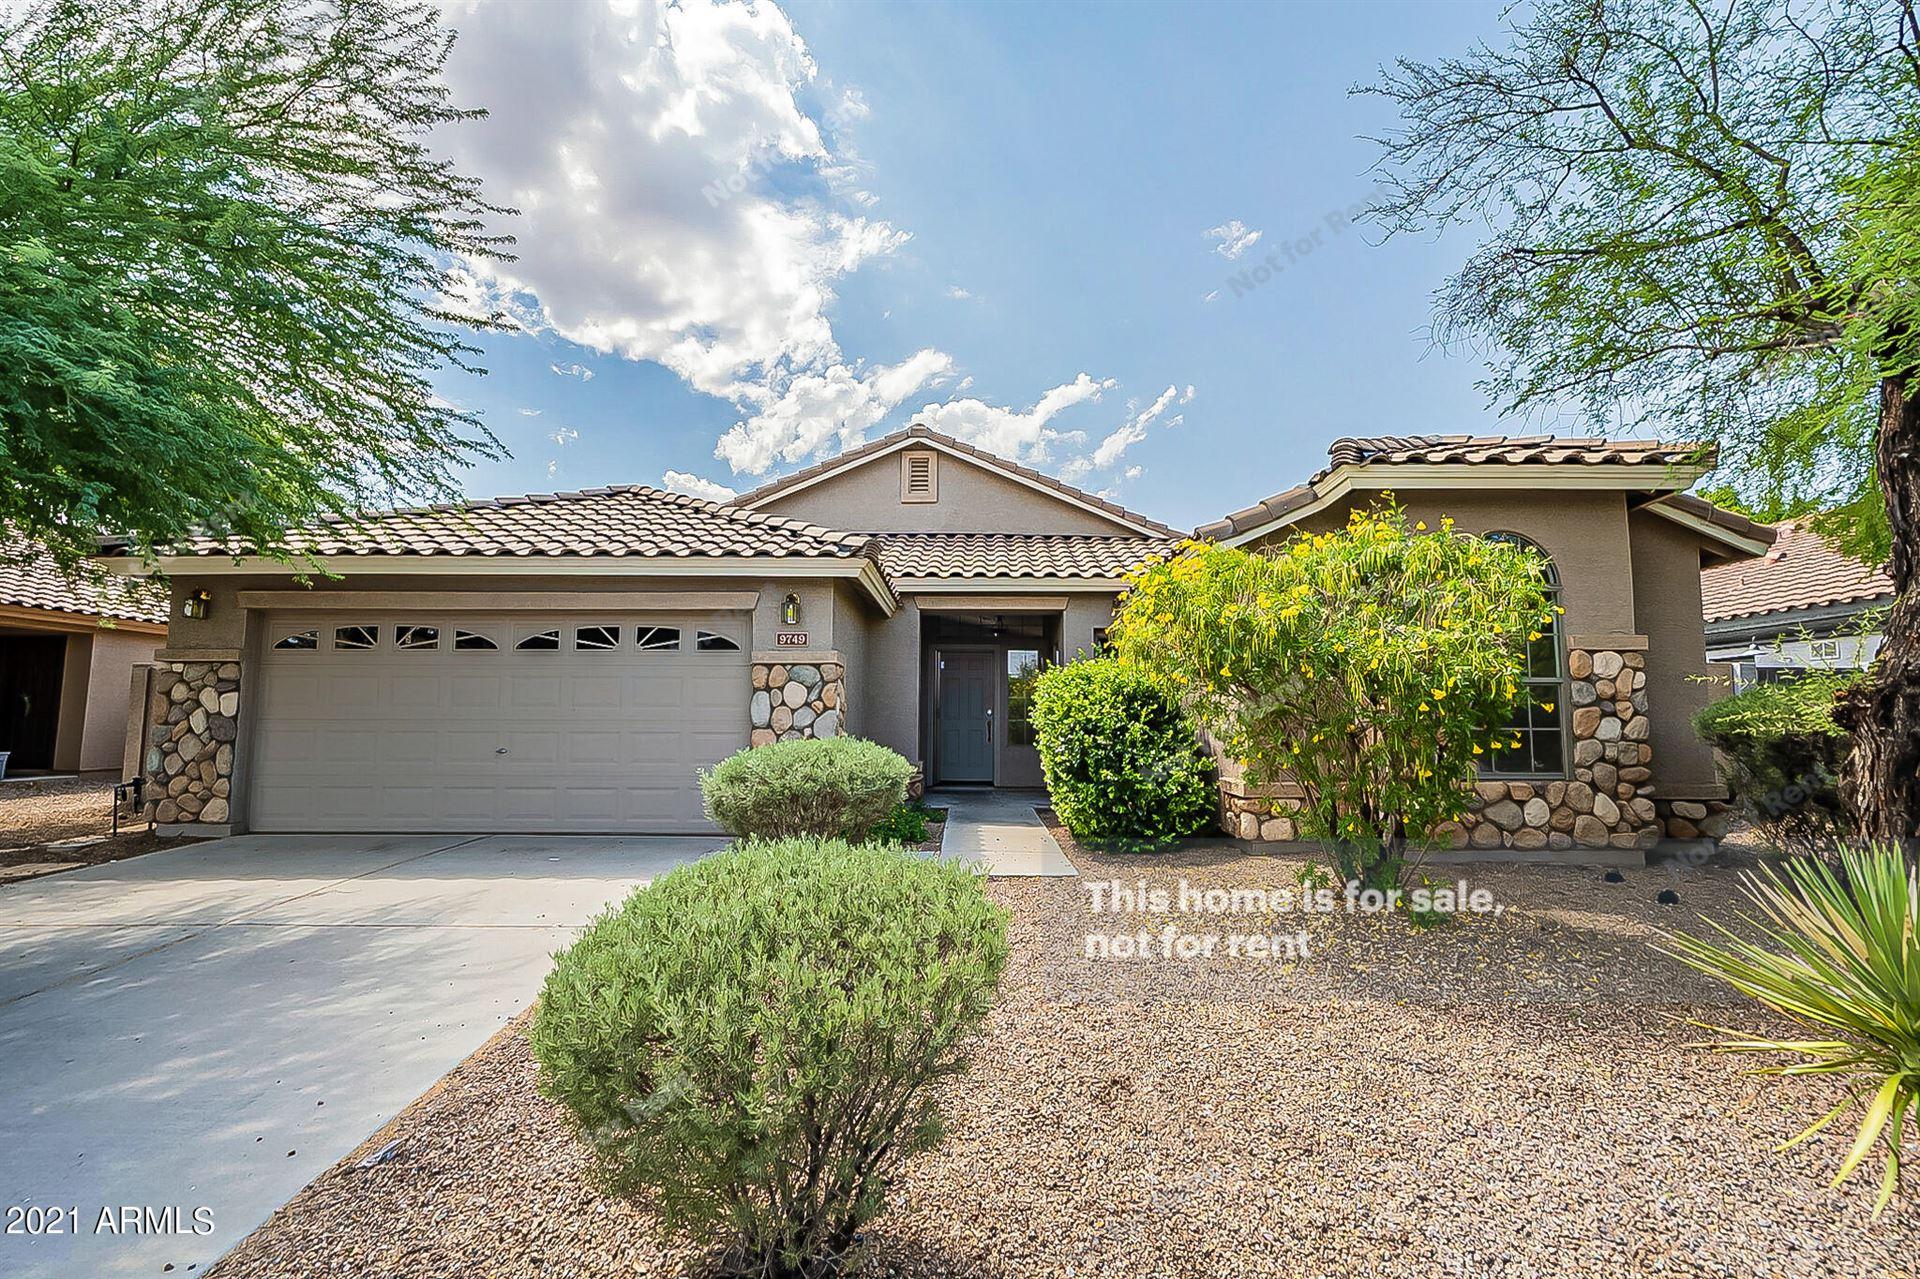 Photo of 9749 E KIOWA Avenue, Mesa, AZ 85209 (MLS # 6296365)